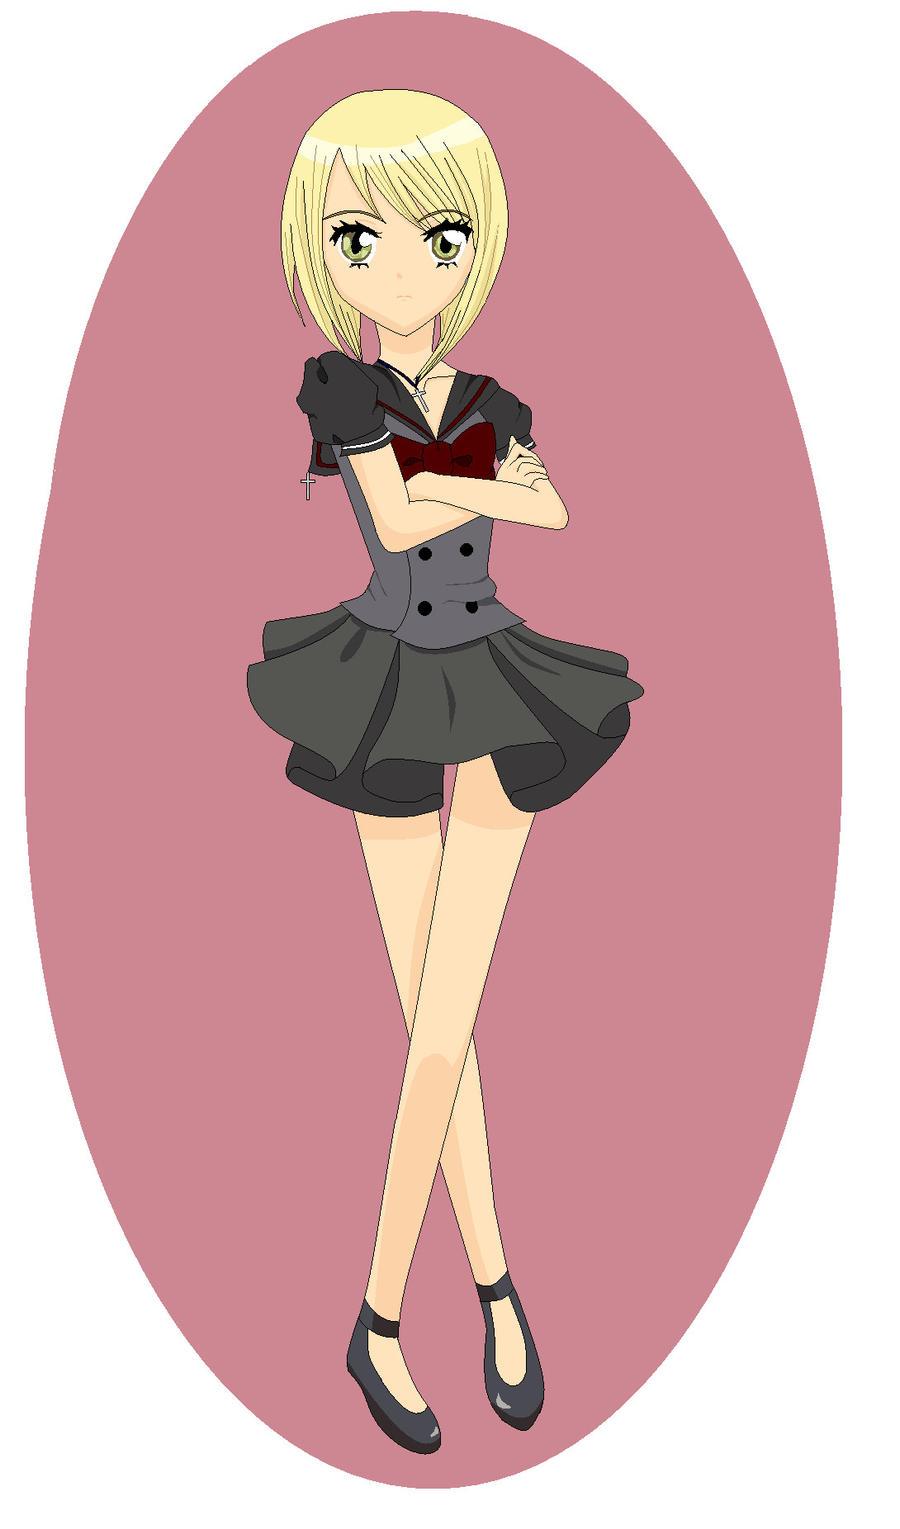 Shugo Chara OC Kuroi by animechaquita34